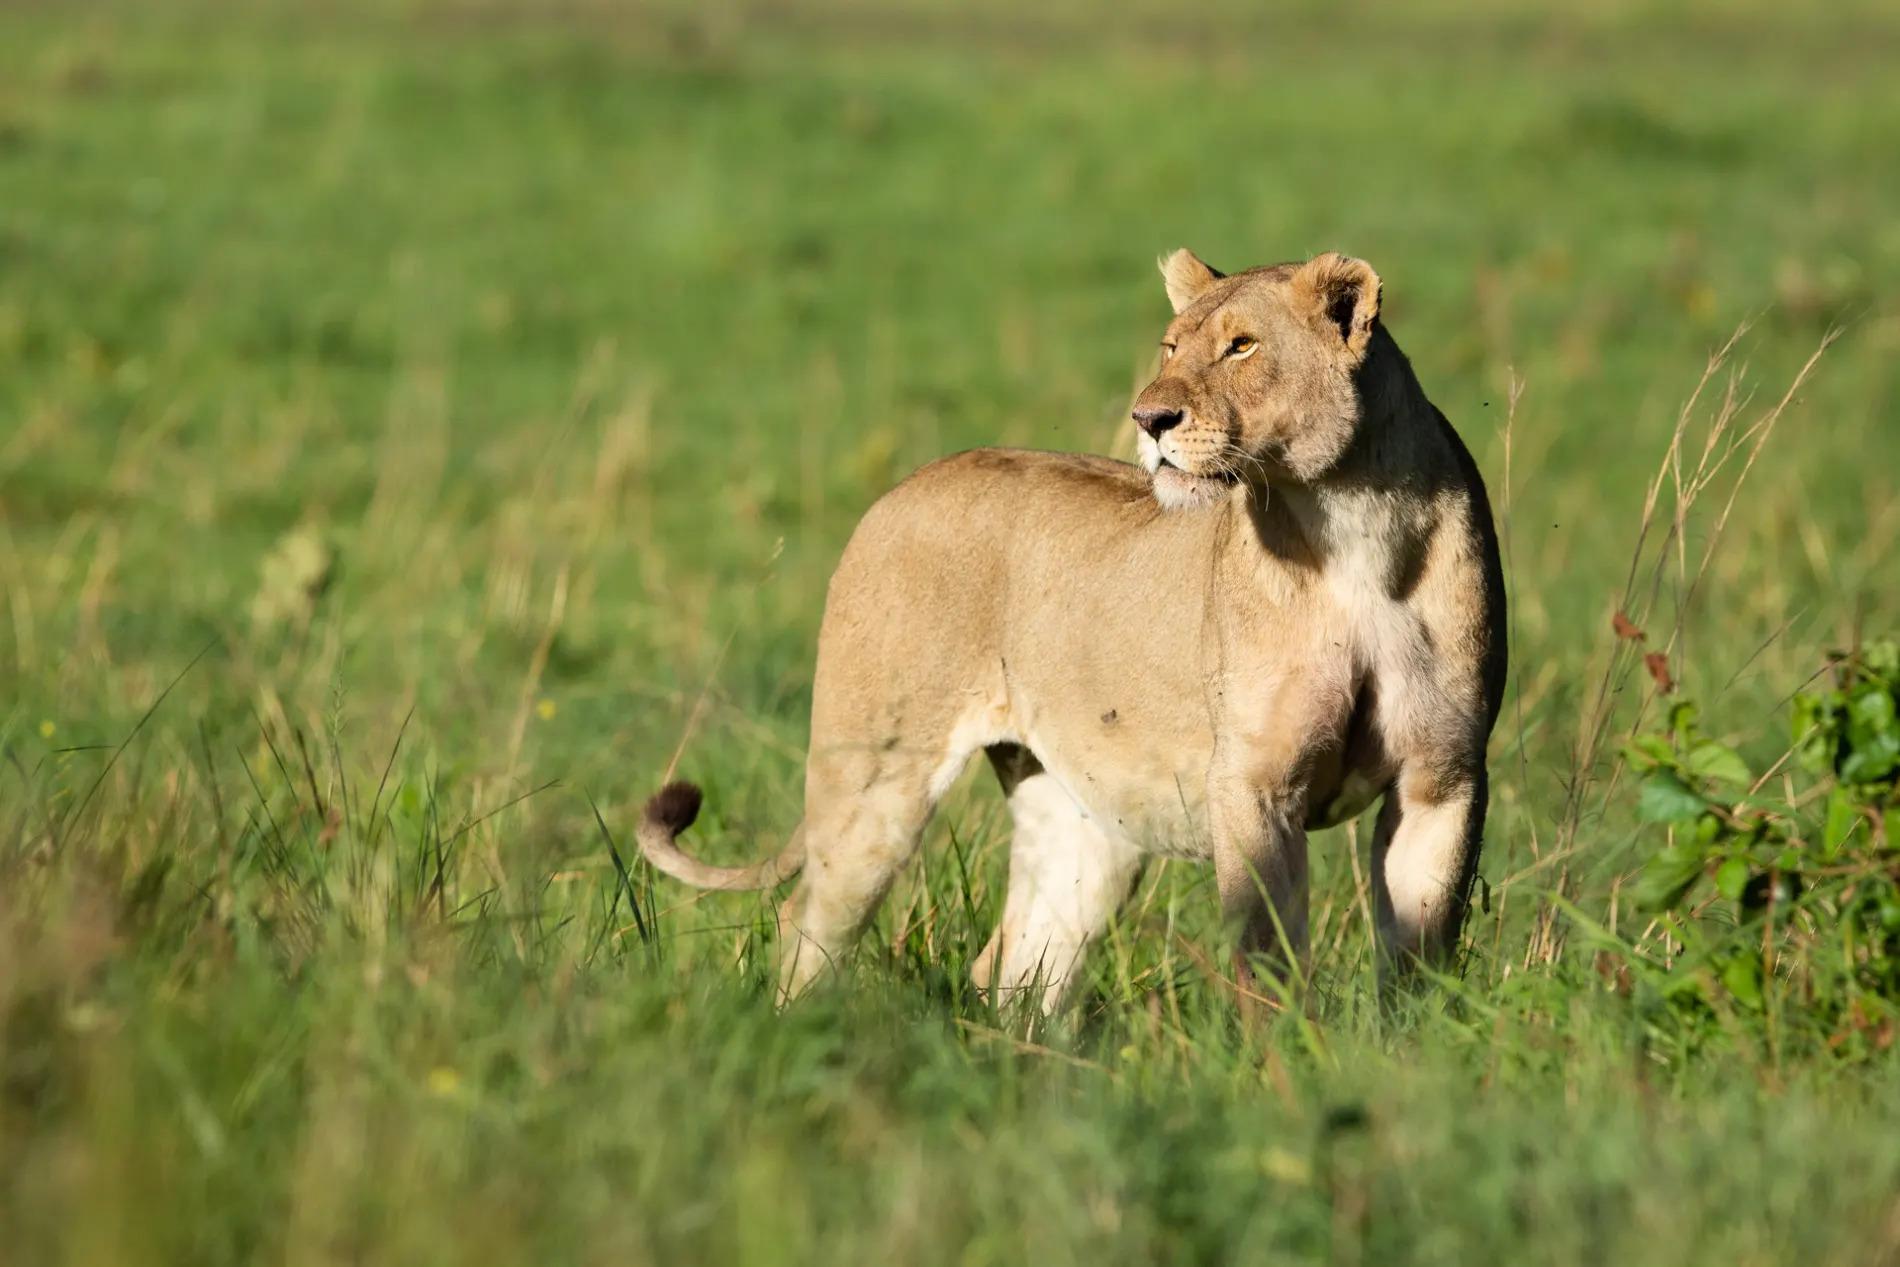 Lioness side